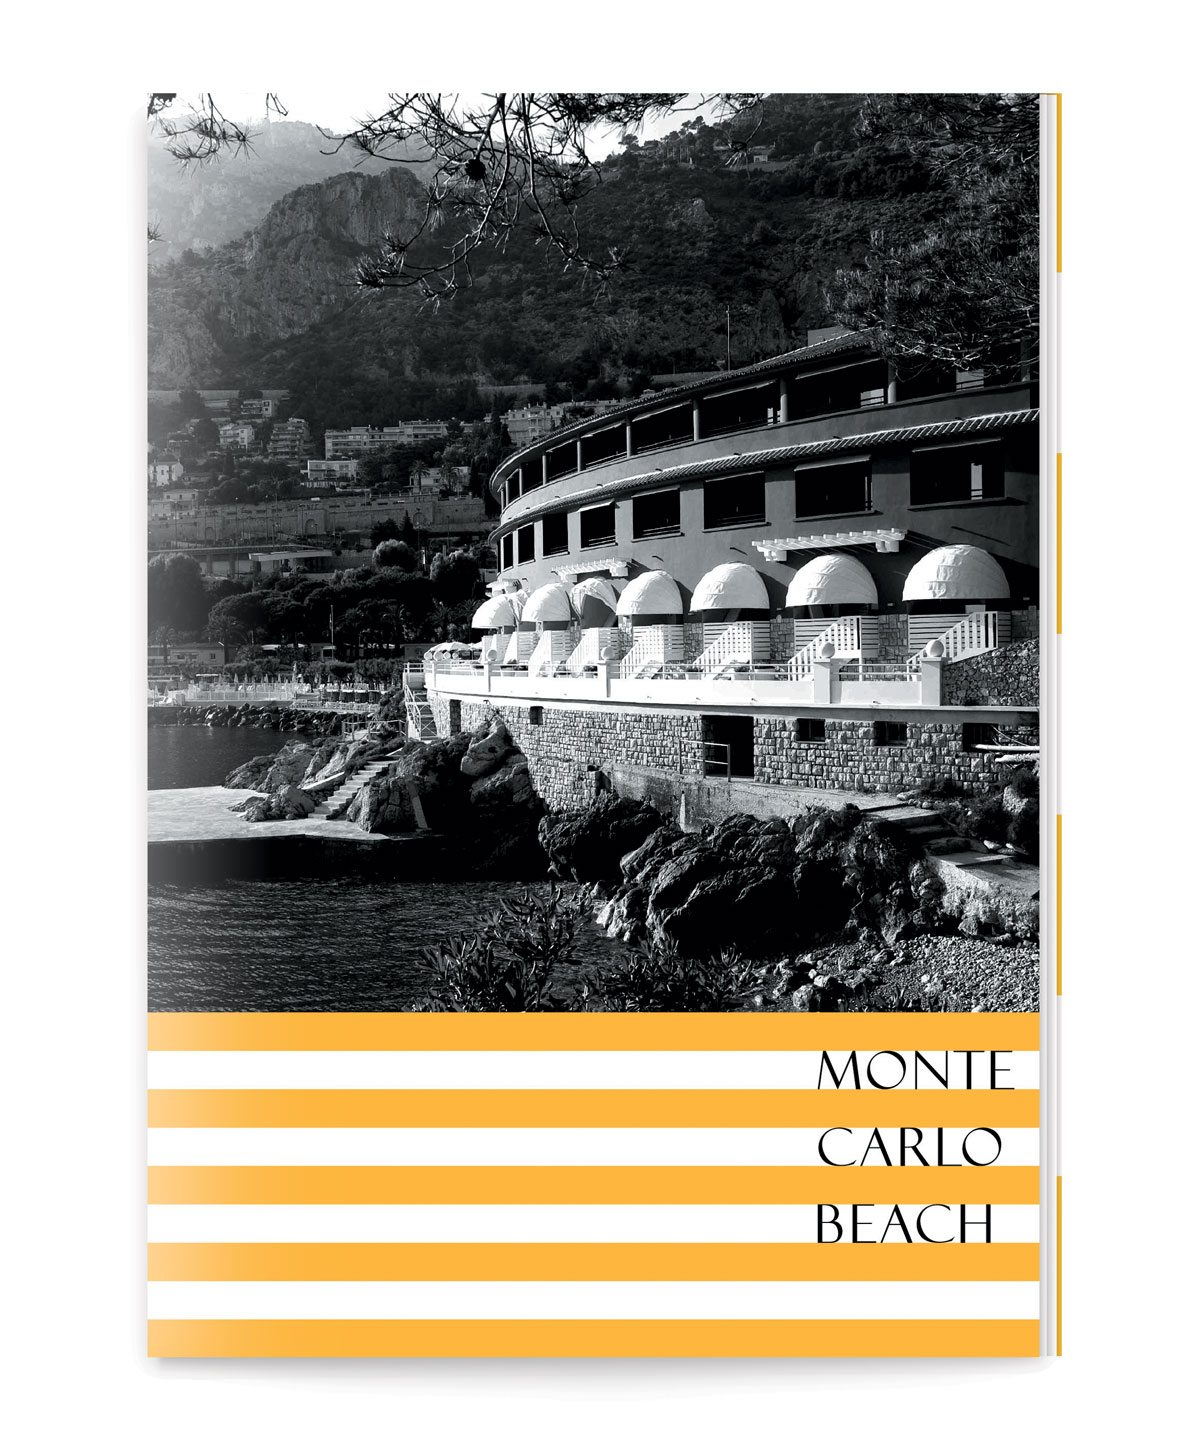 minte carlo beach brochure couverture